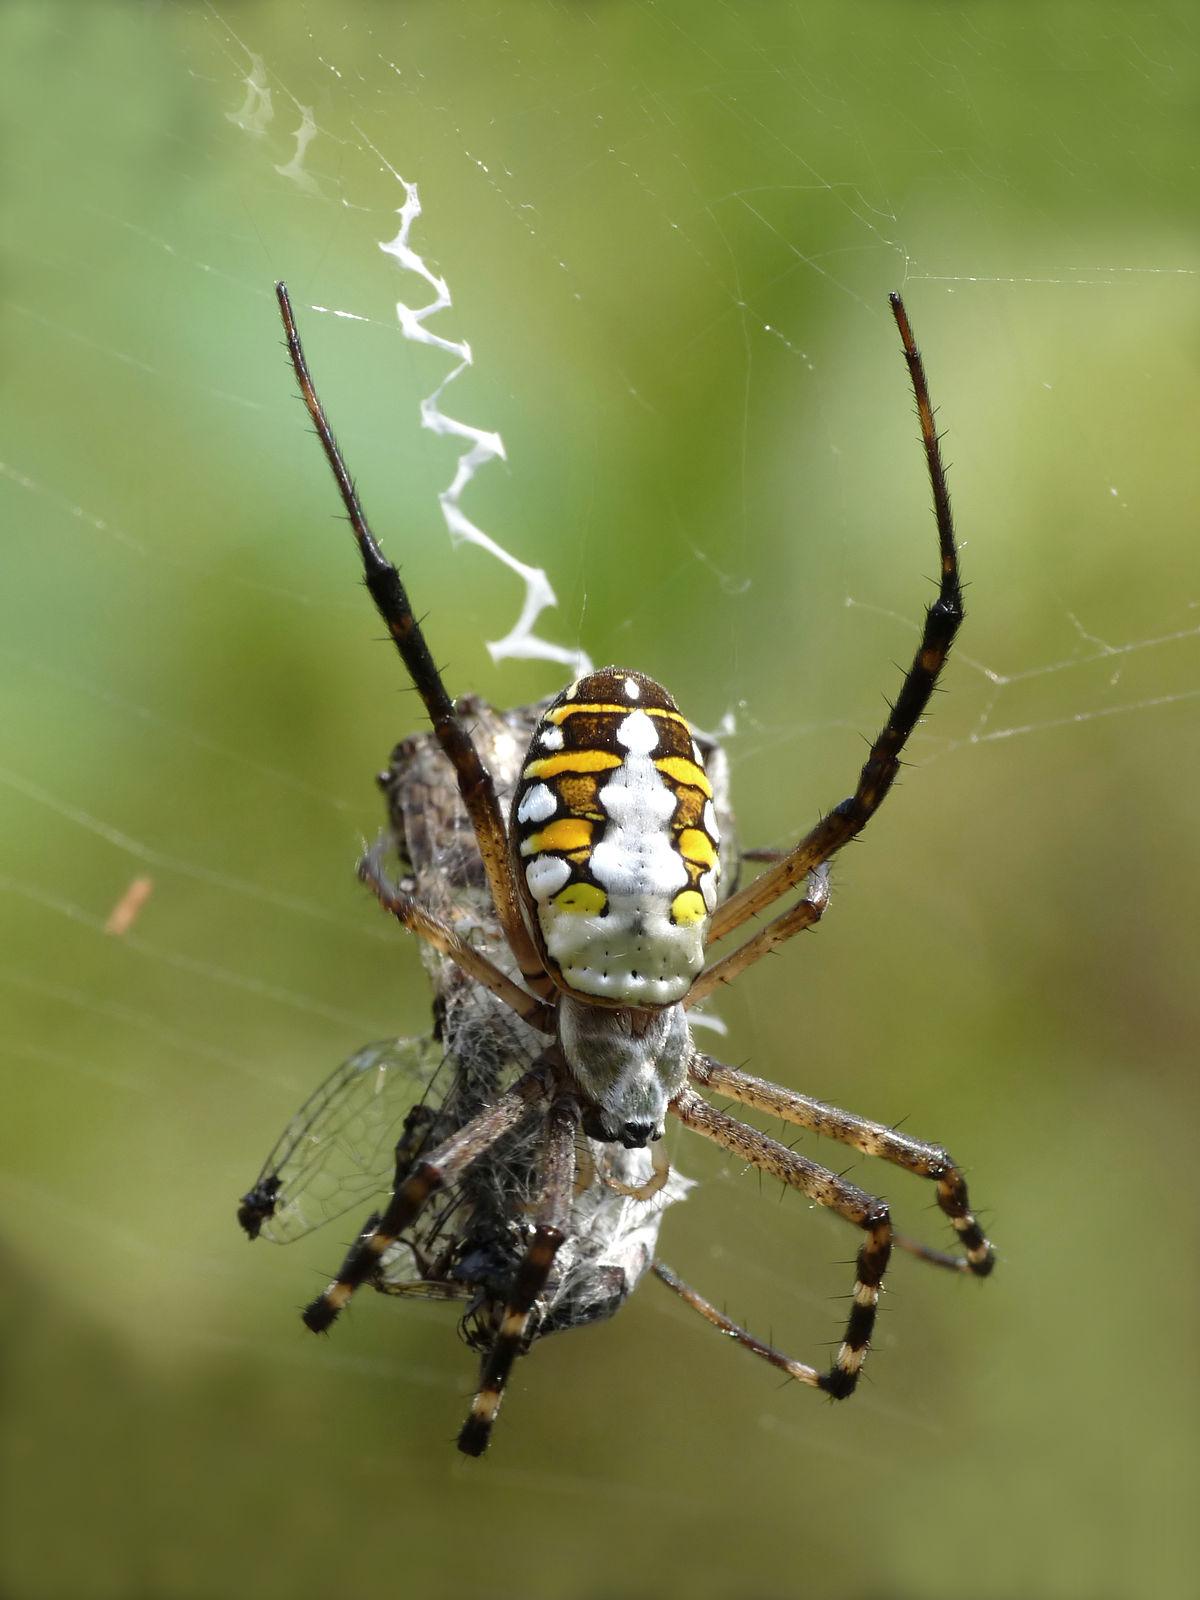 Image result for orb spider in web